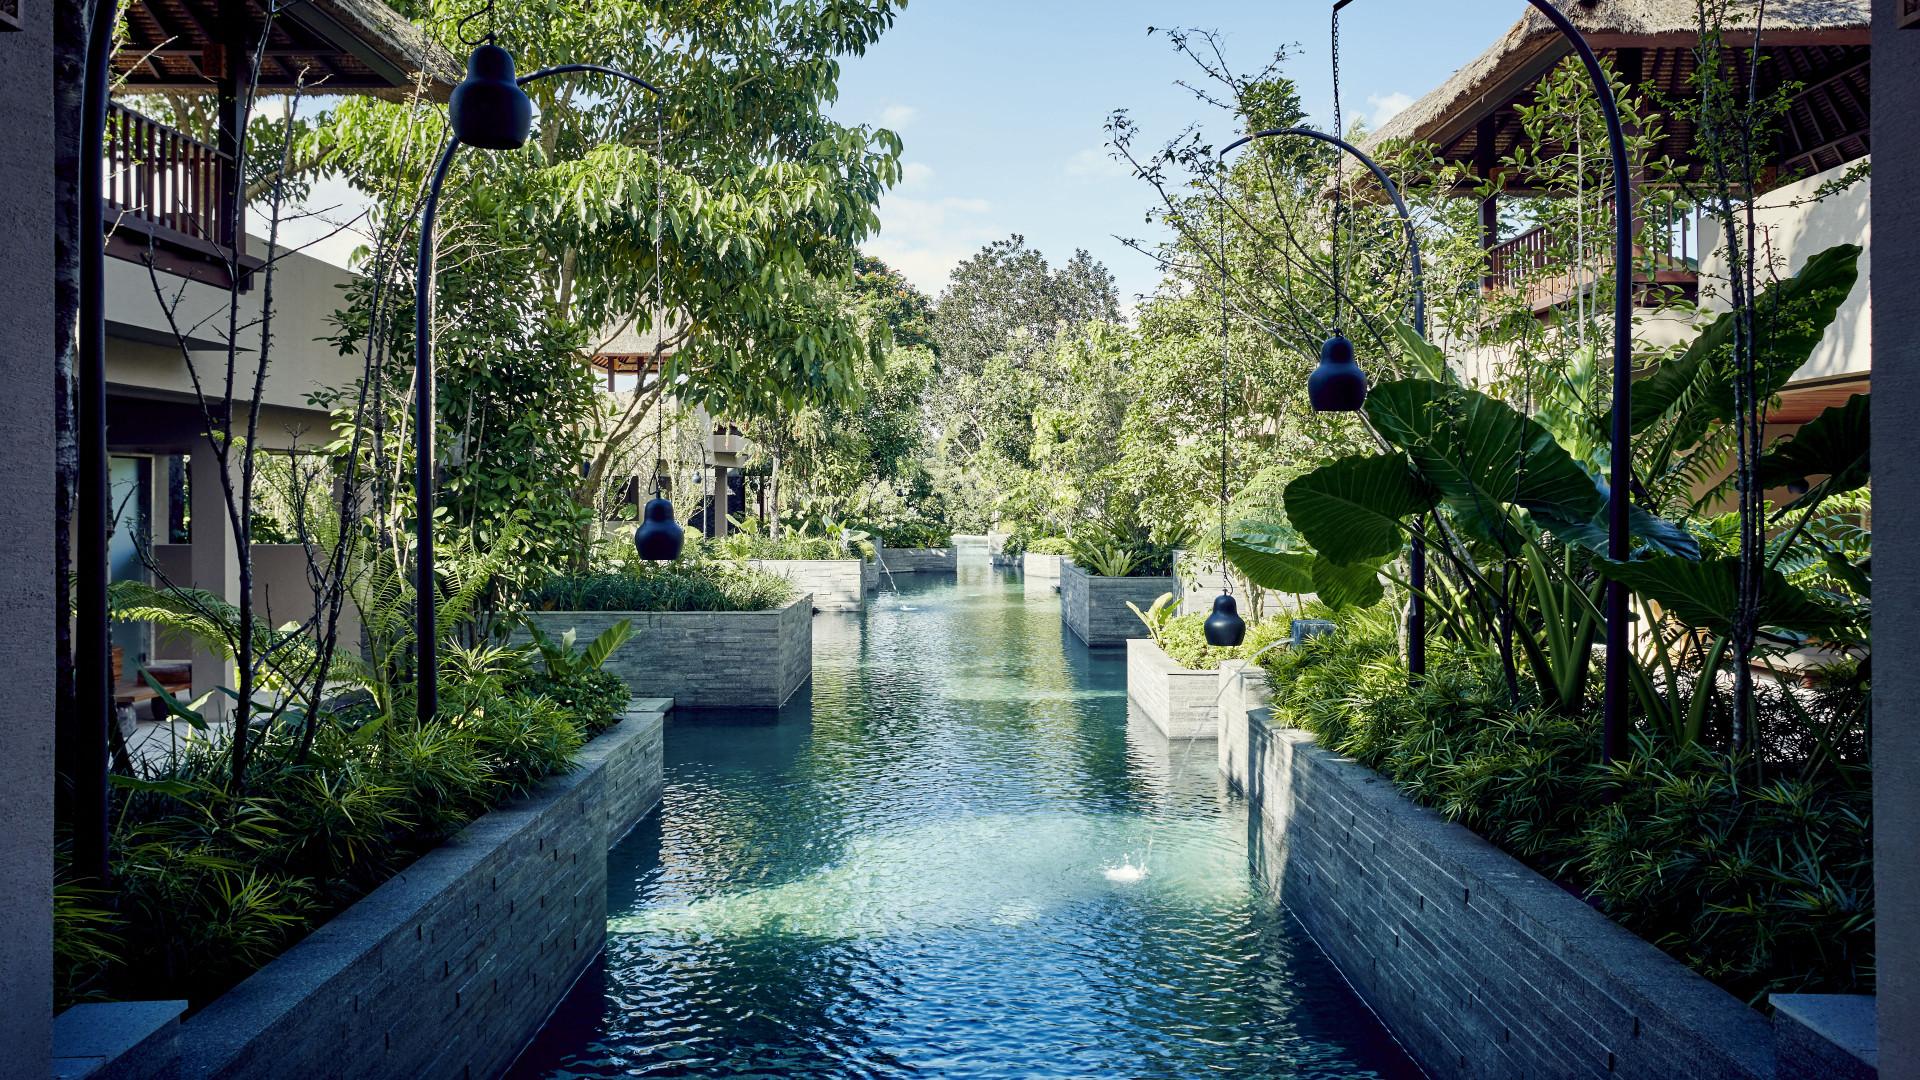 World's Most Awesome Swimming Pools: Hoshinoya Bali